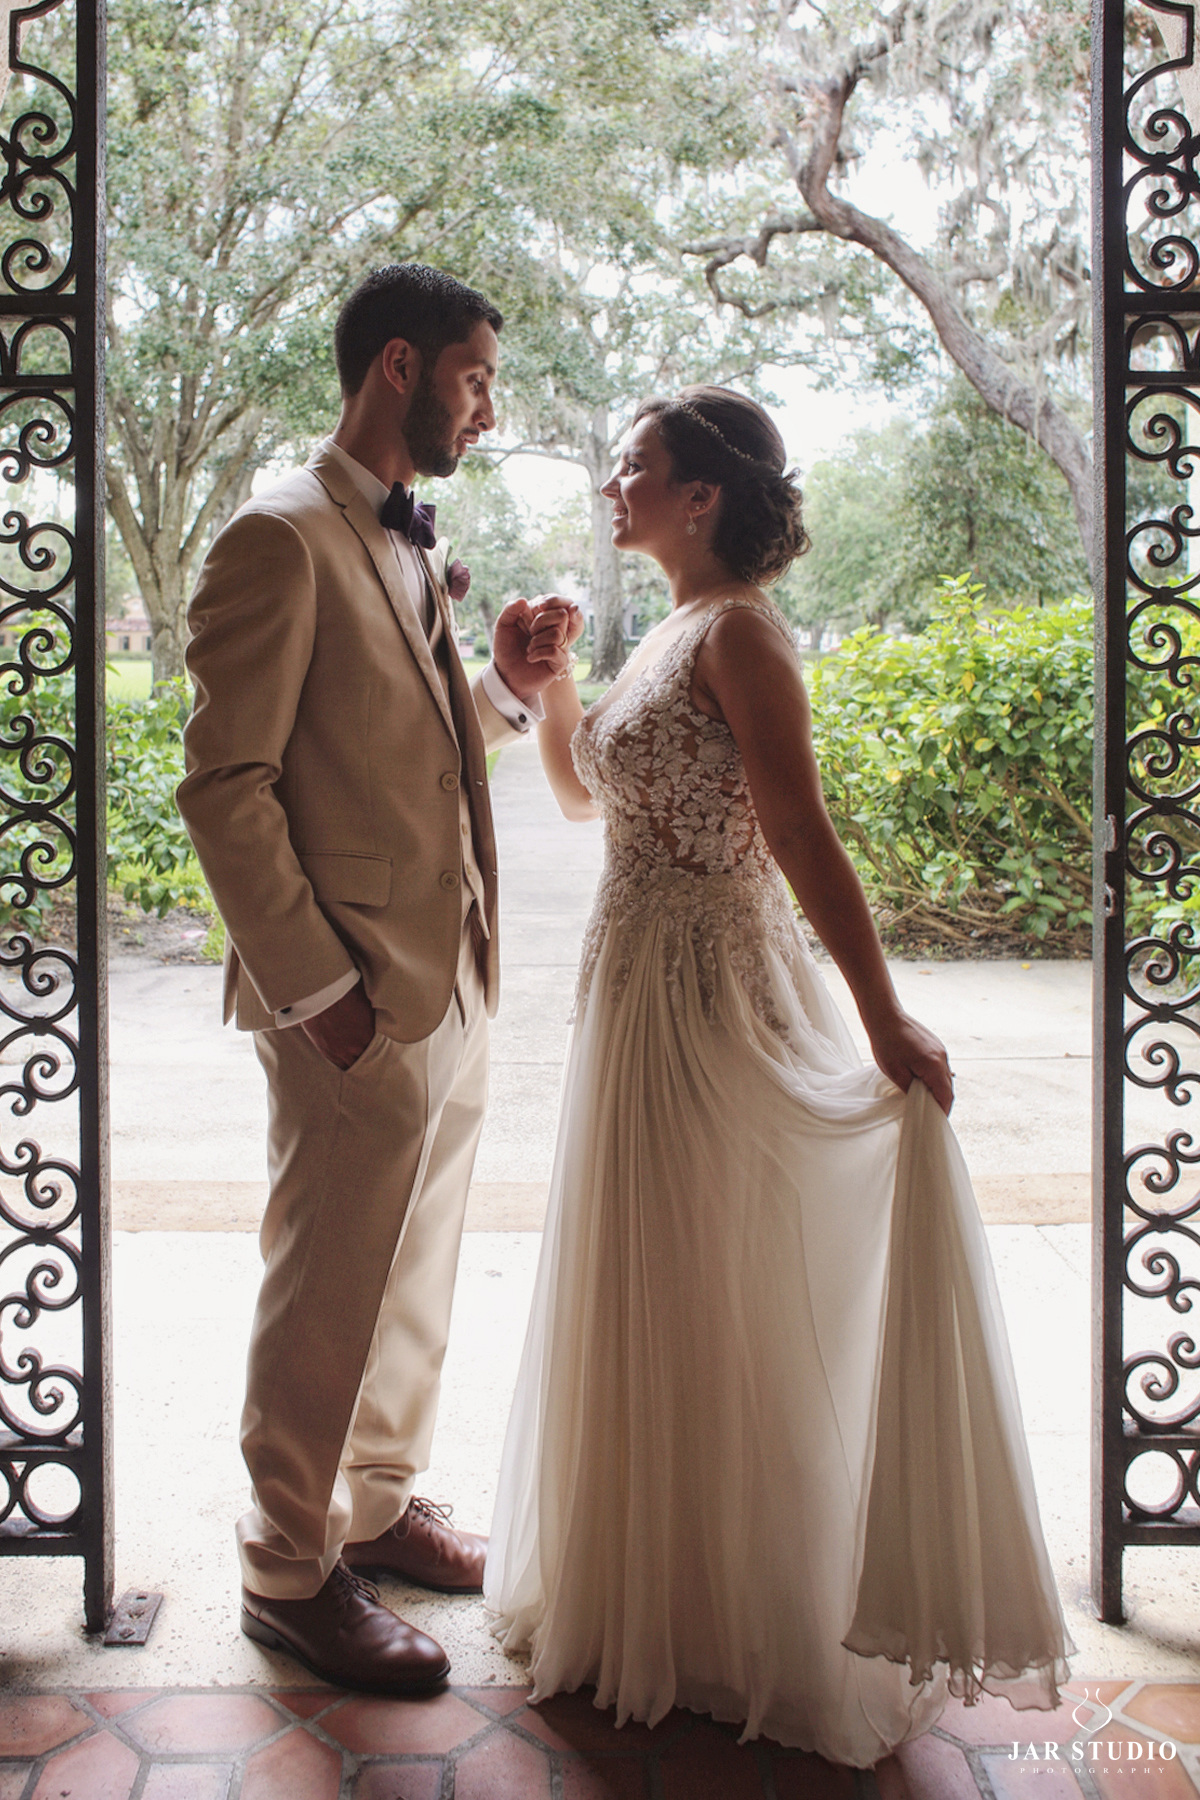 rollins-cornell-jarstudio-wedding-photographer-408.JPG